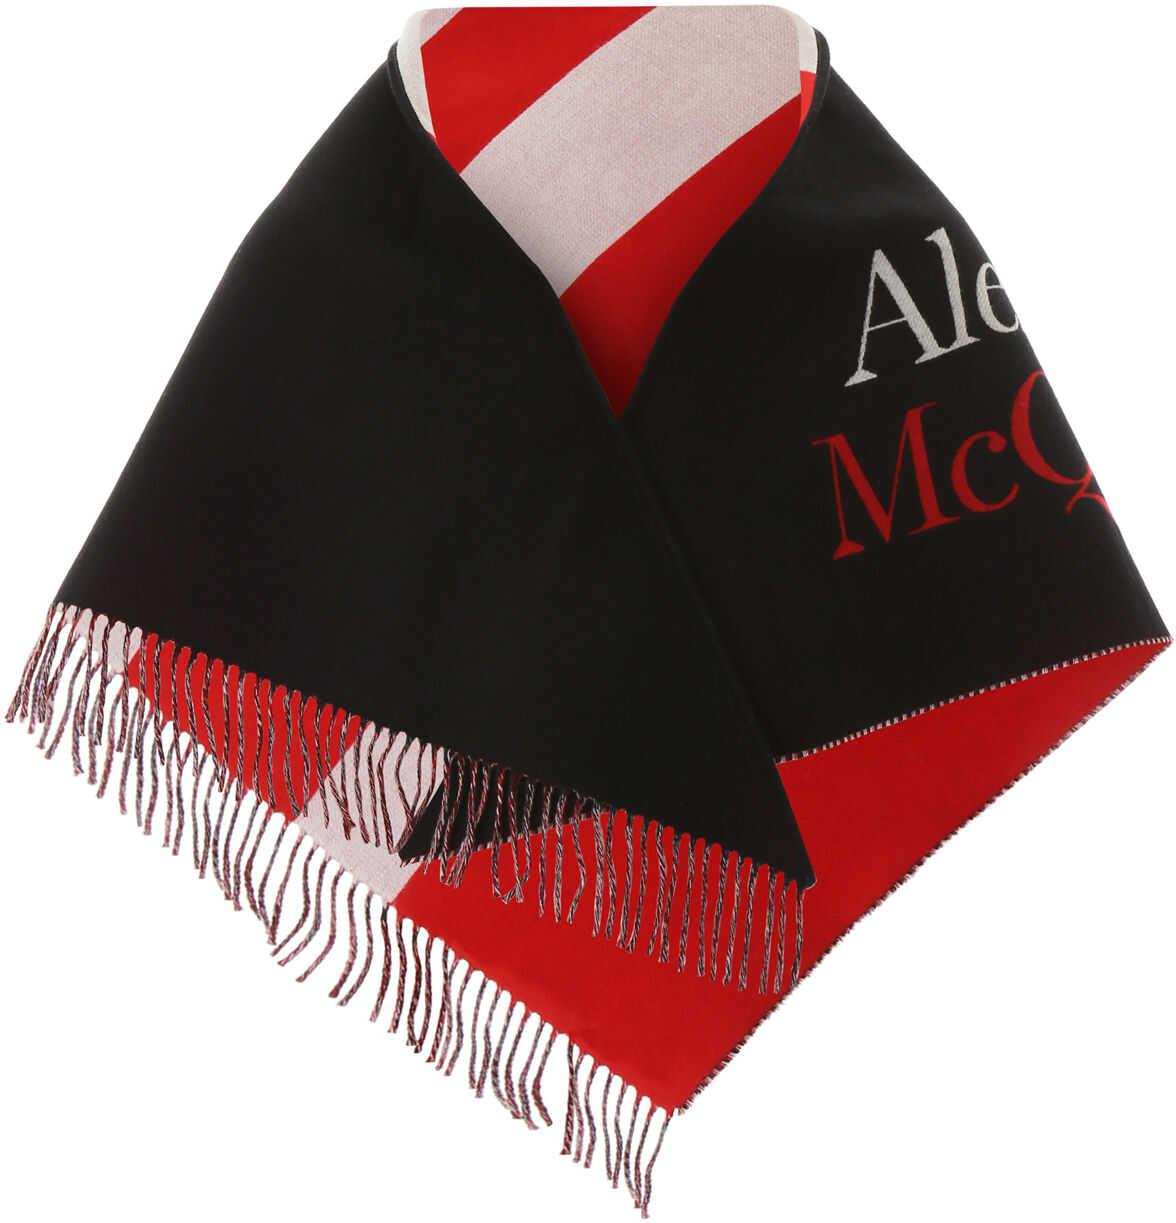 Alexander McQueen Jacquard Logo Scarf BLACK IVORY